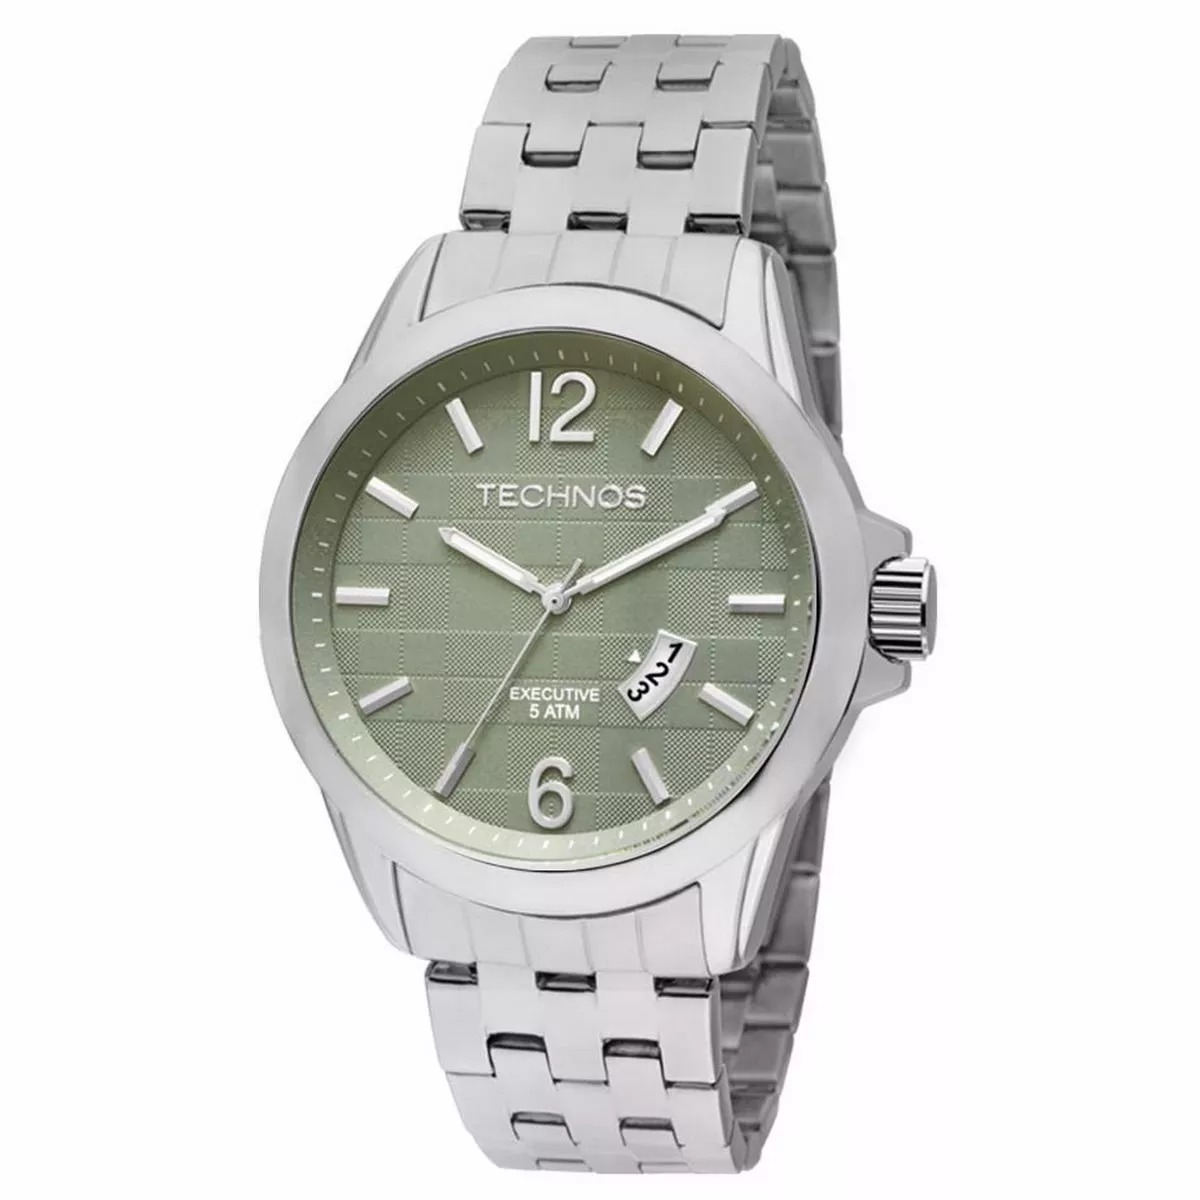 6699b625b20 relógio technos masculino analógico prata 2115krp 3v aço. Carregando zoom.